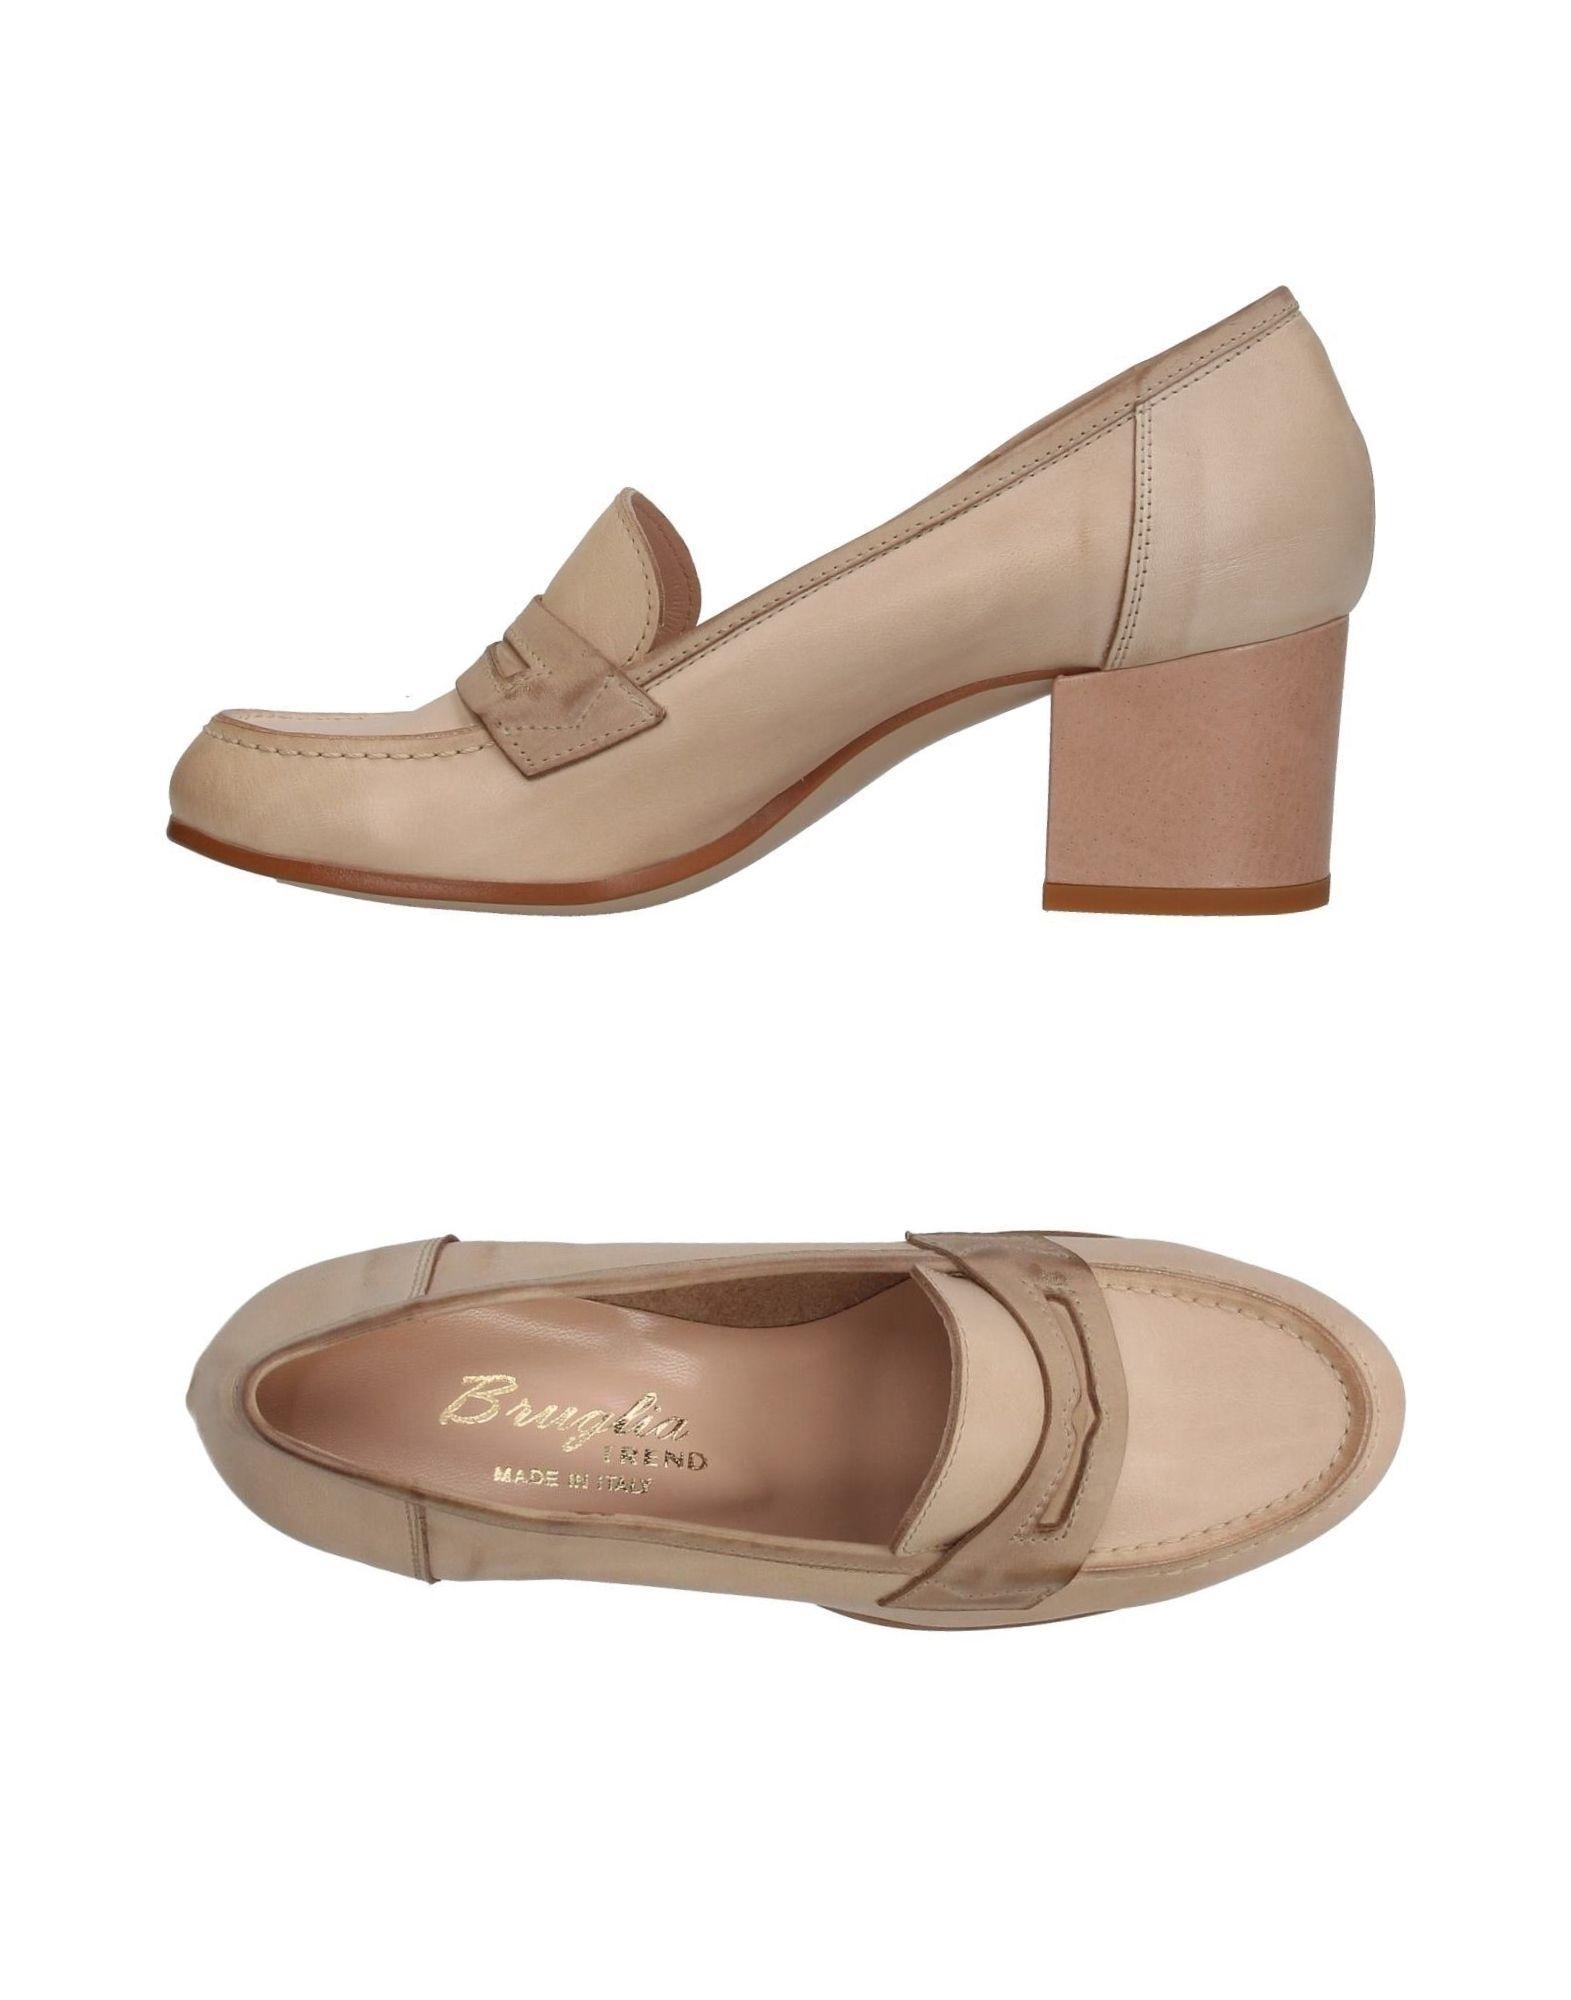 F.Lli Bruglia Mokassins Damen  11408349GO Gute Qualität beliebte Schuhe